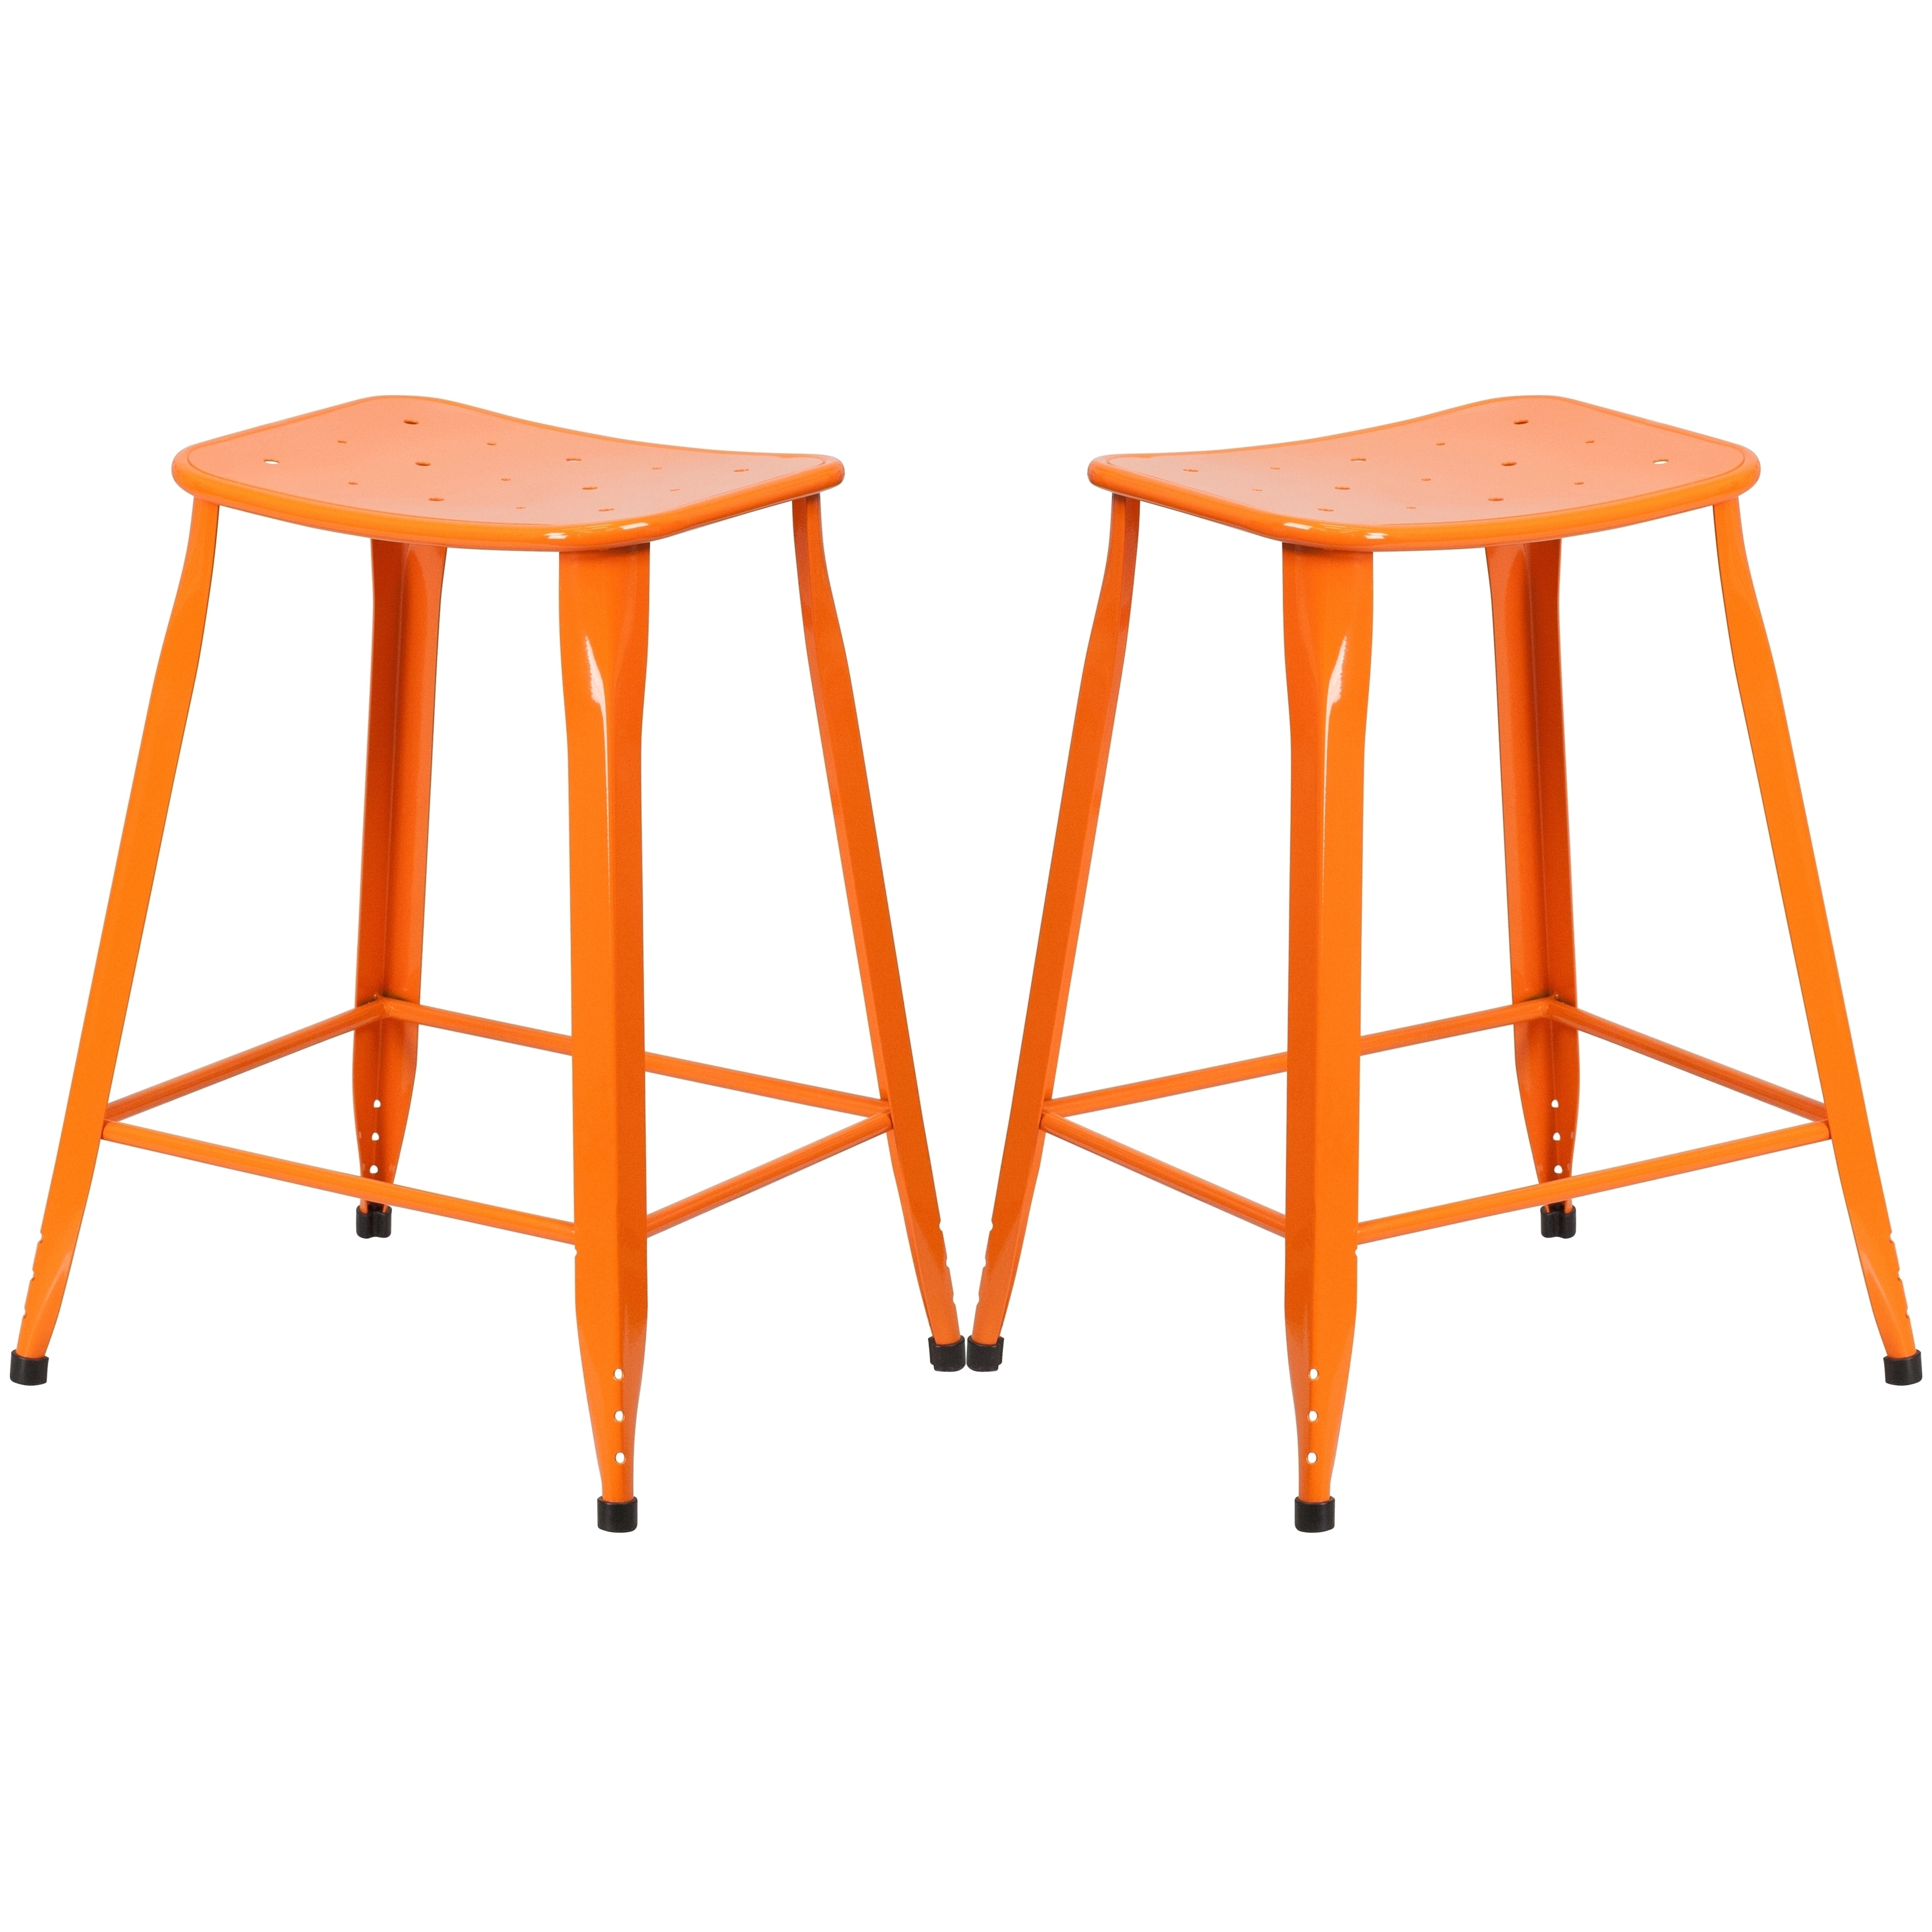 A Line Furniture Orange Galvanized Metal 24 Inch Stool Walmartcom